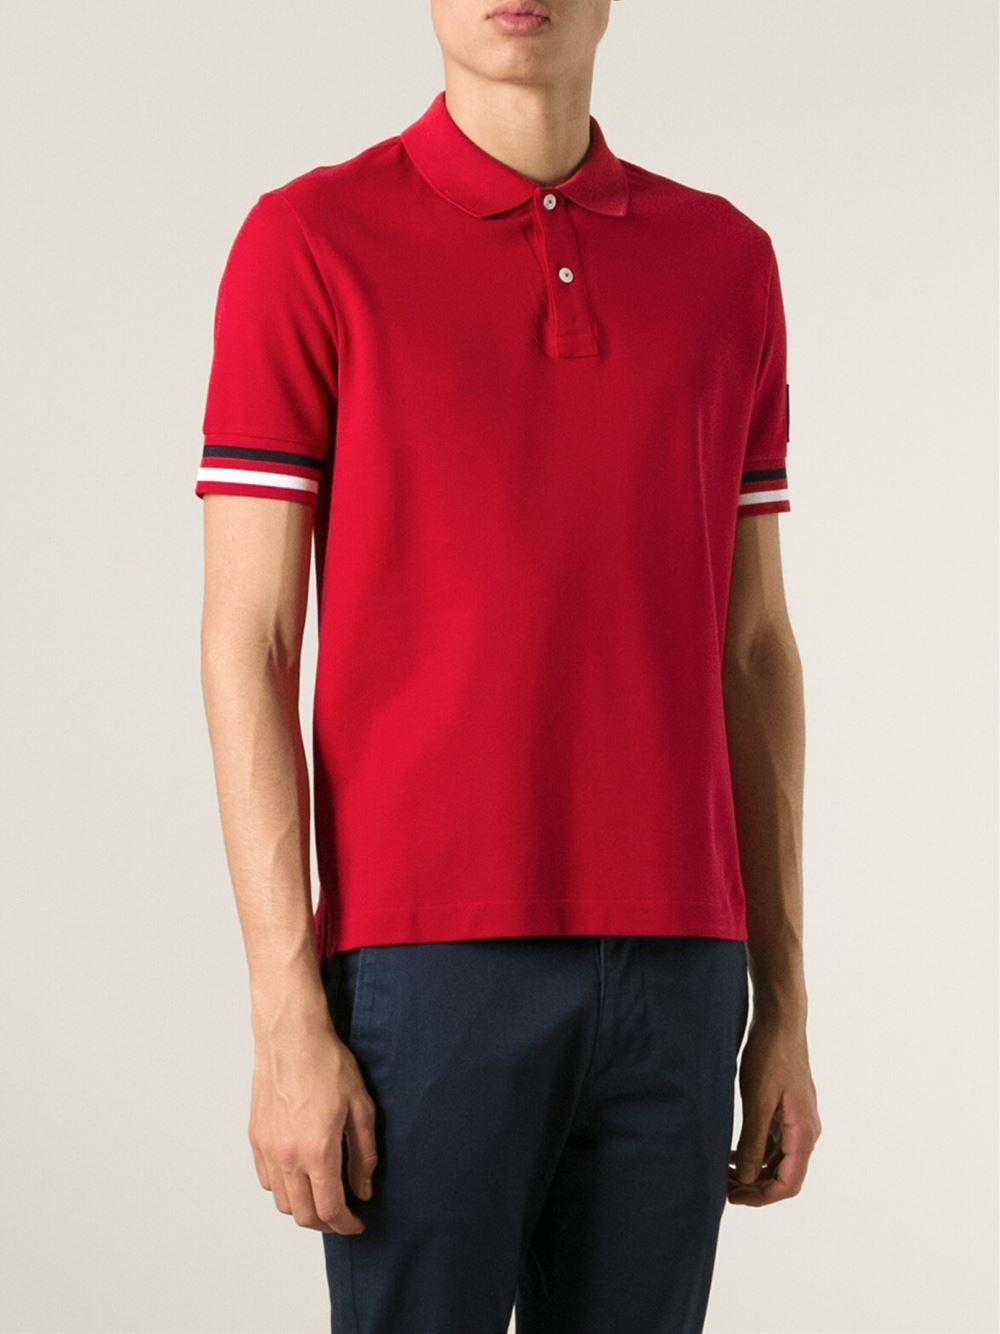 8e8efbeb81c7 get bleu striped polo shirt 9fc50 1d159